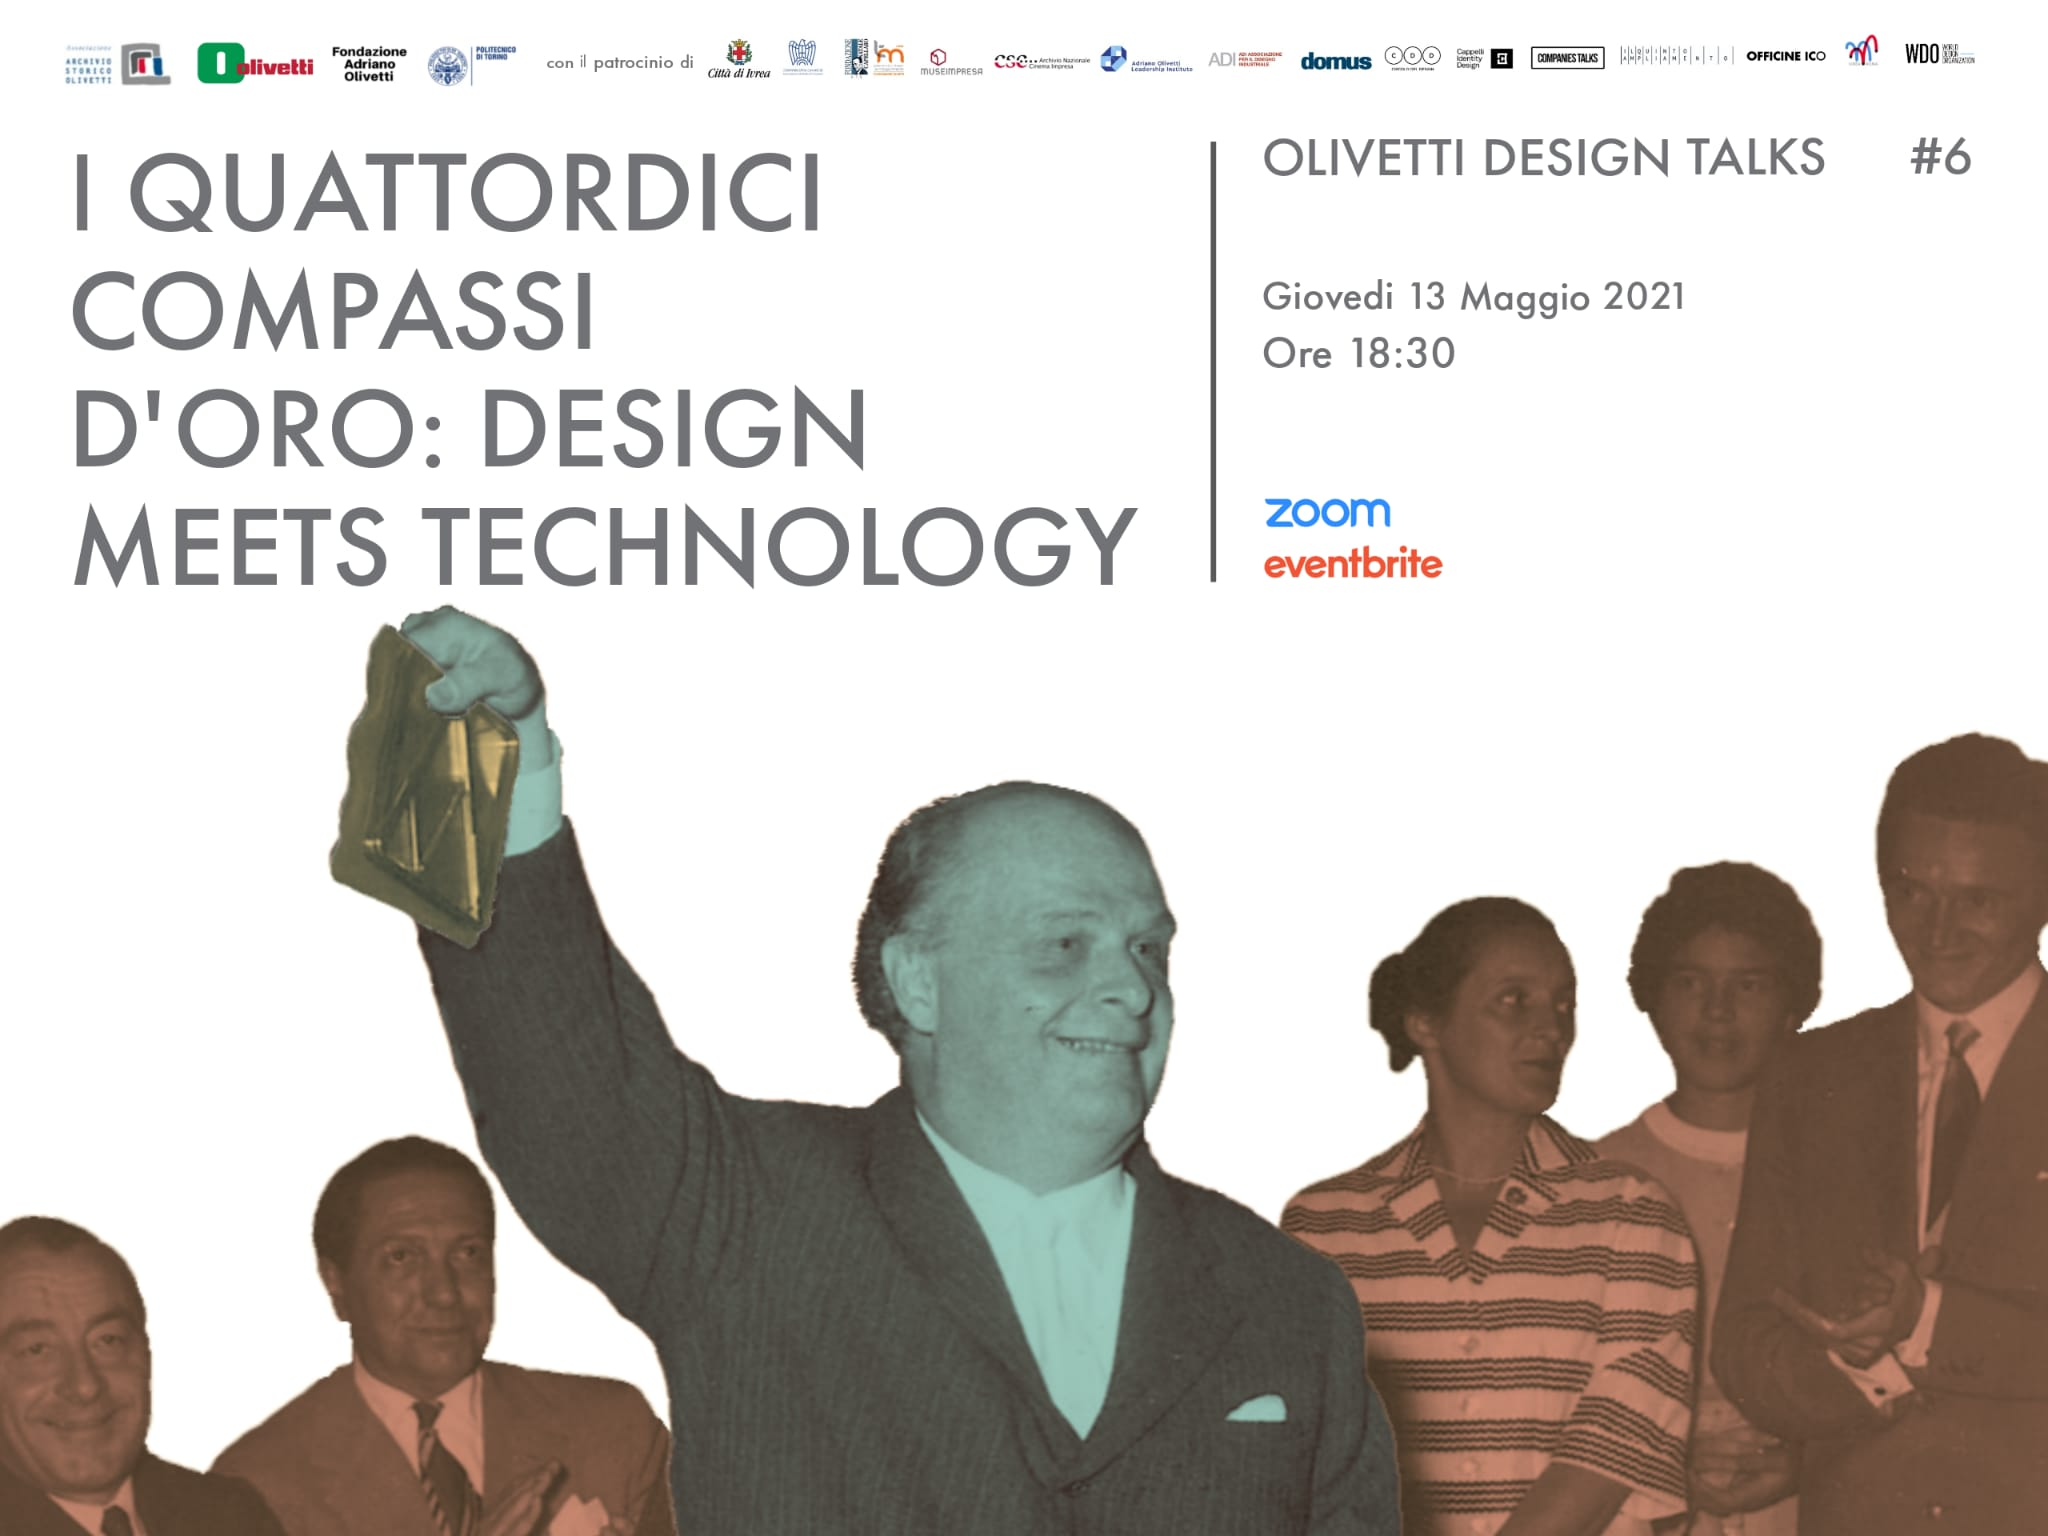 I 14 Compassi d'Oro: #DesignMeetsTechnology